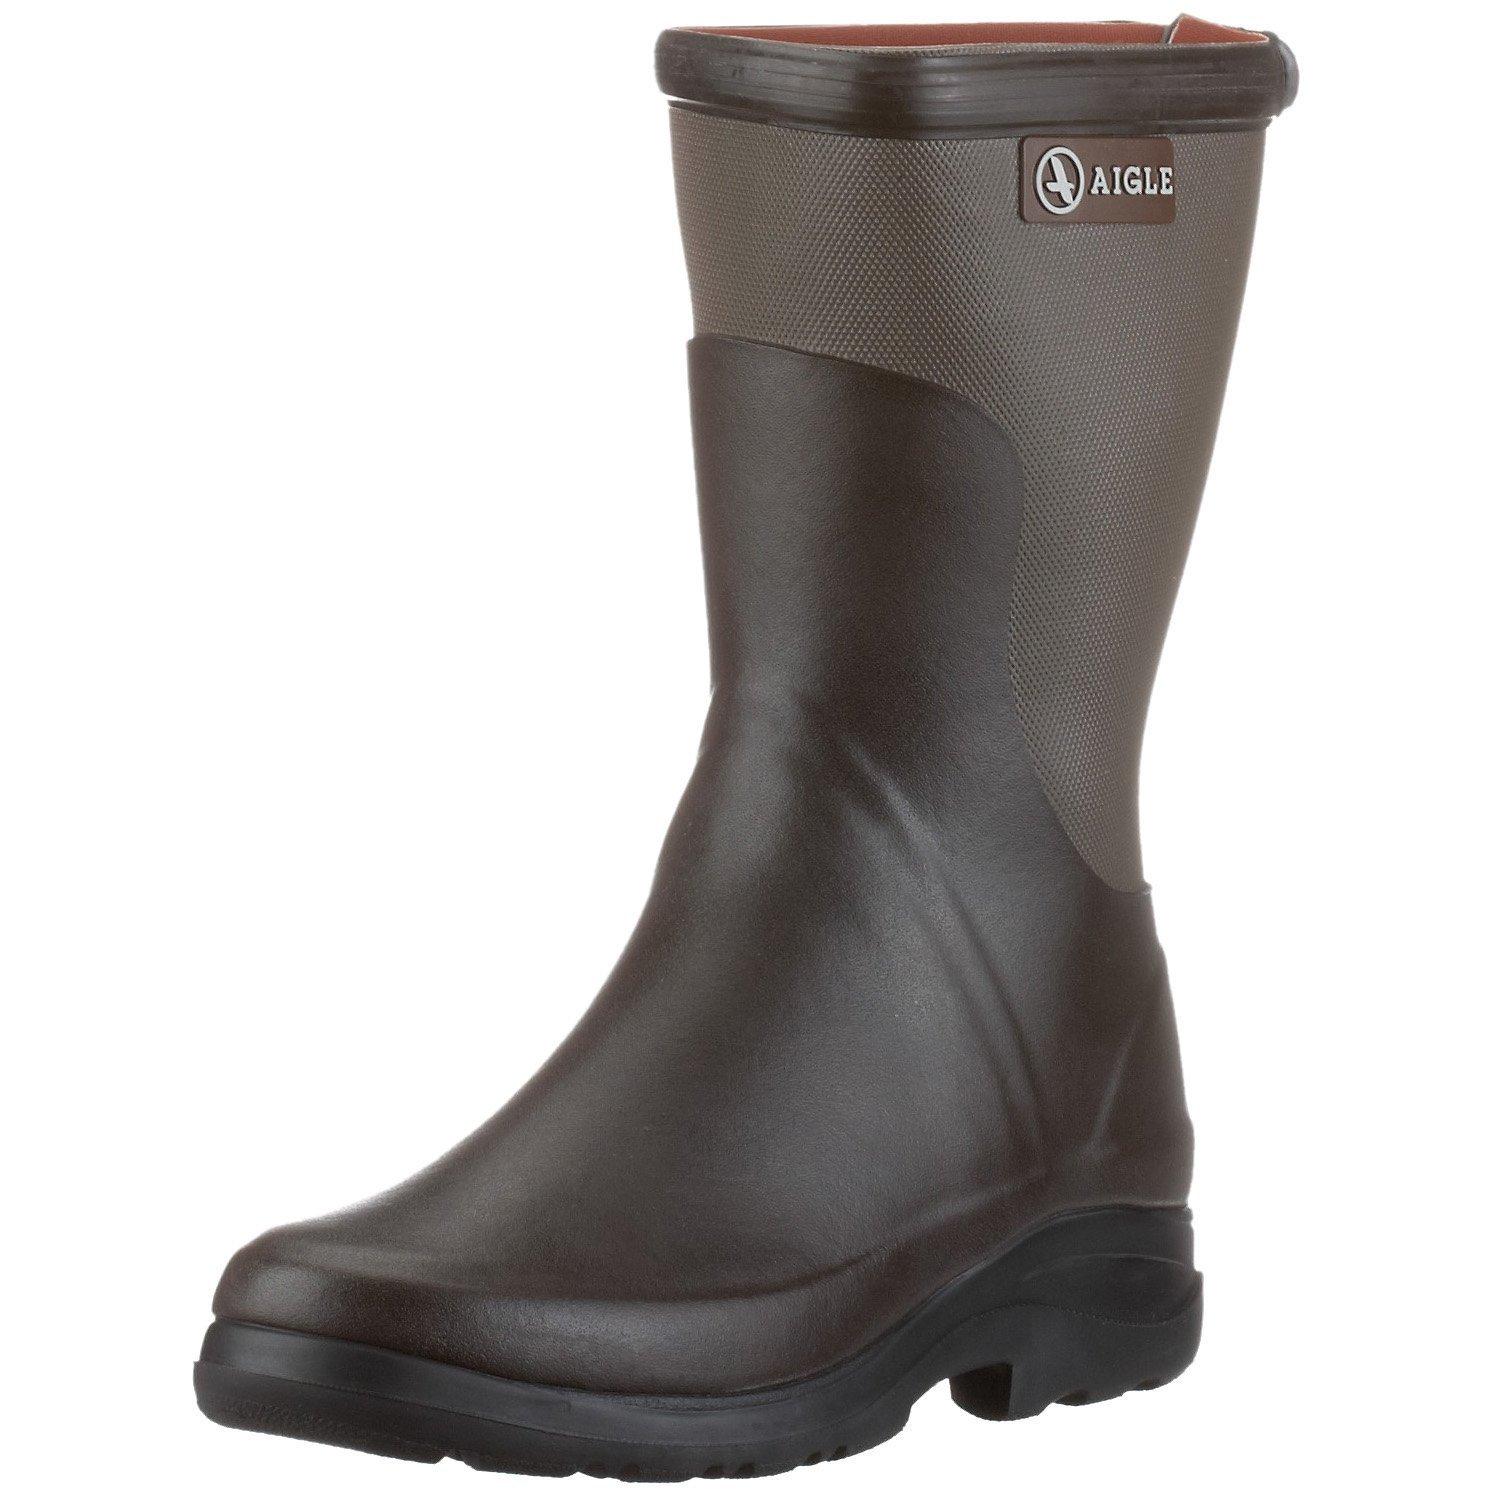 Aigle (Brun/Taupe) Rboot Bottillon, Chaussures Multisport Outdoor Mixte Adulte Aigle 19999 Marron (Brun/Taupe) cc92f8e - latesttechnology.space